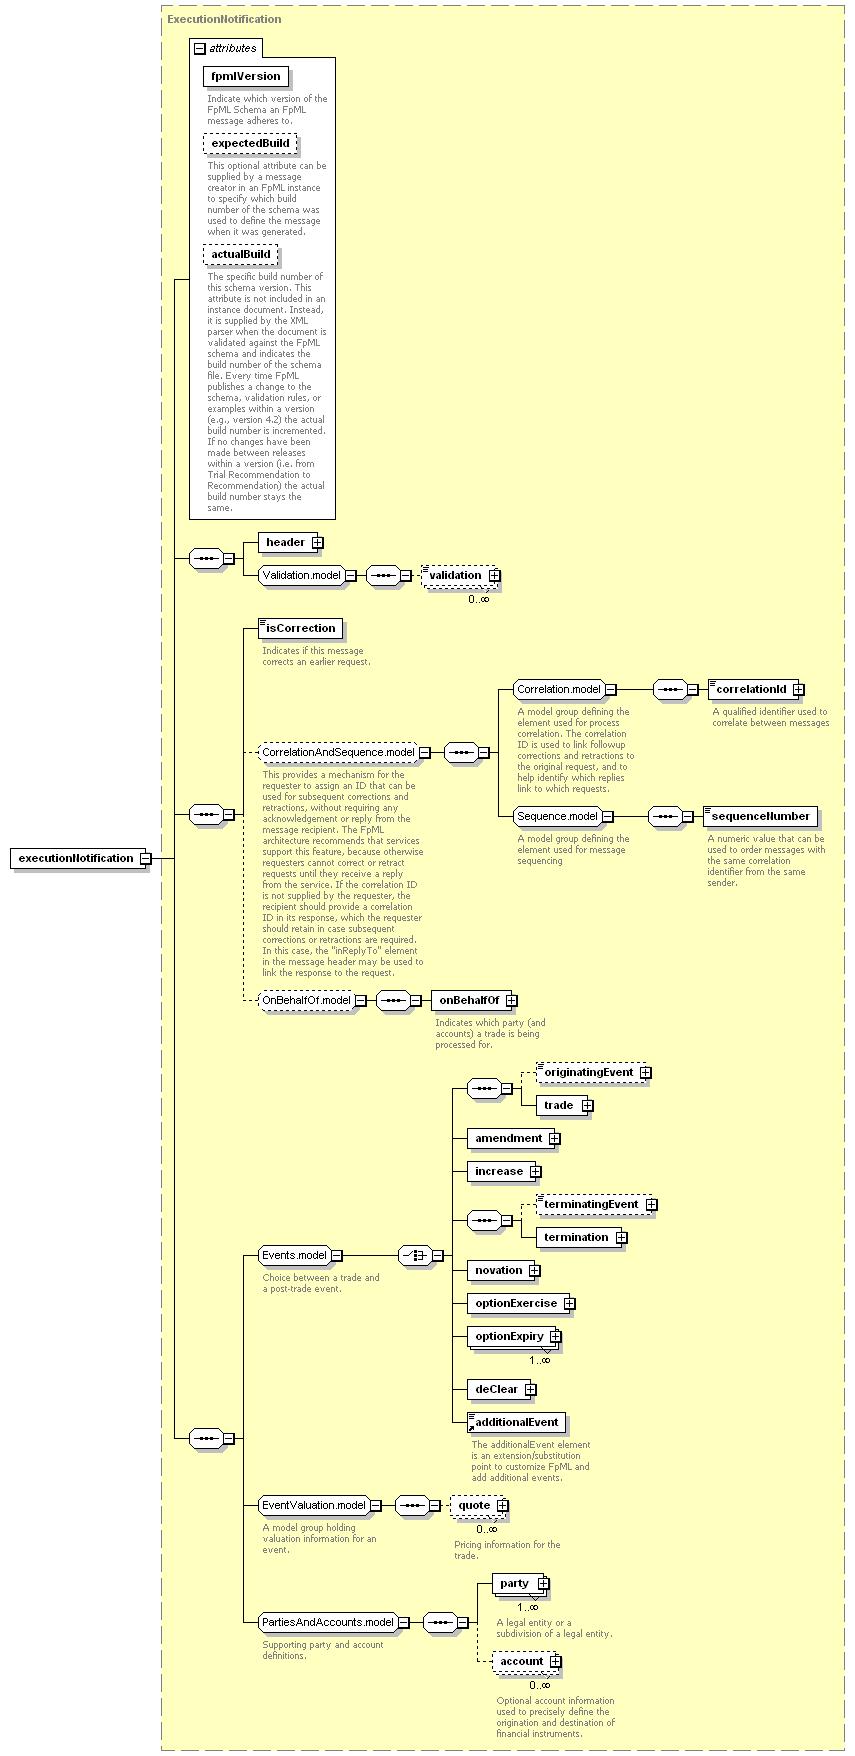 Element executionnotification global xml schema documentation ccuart Images